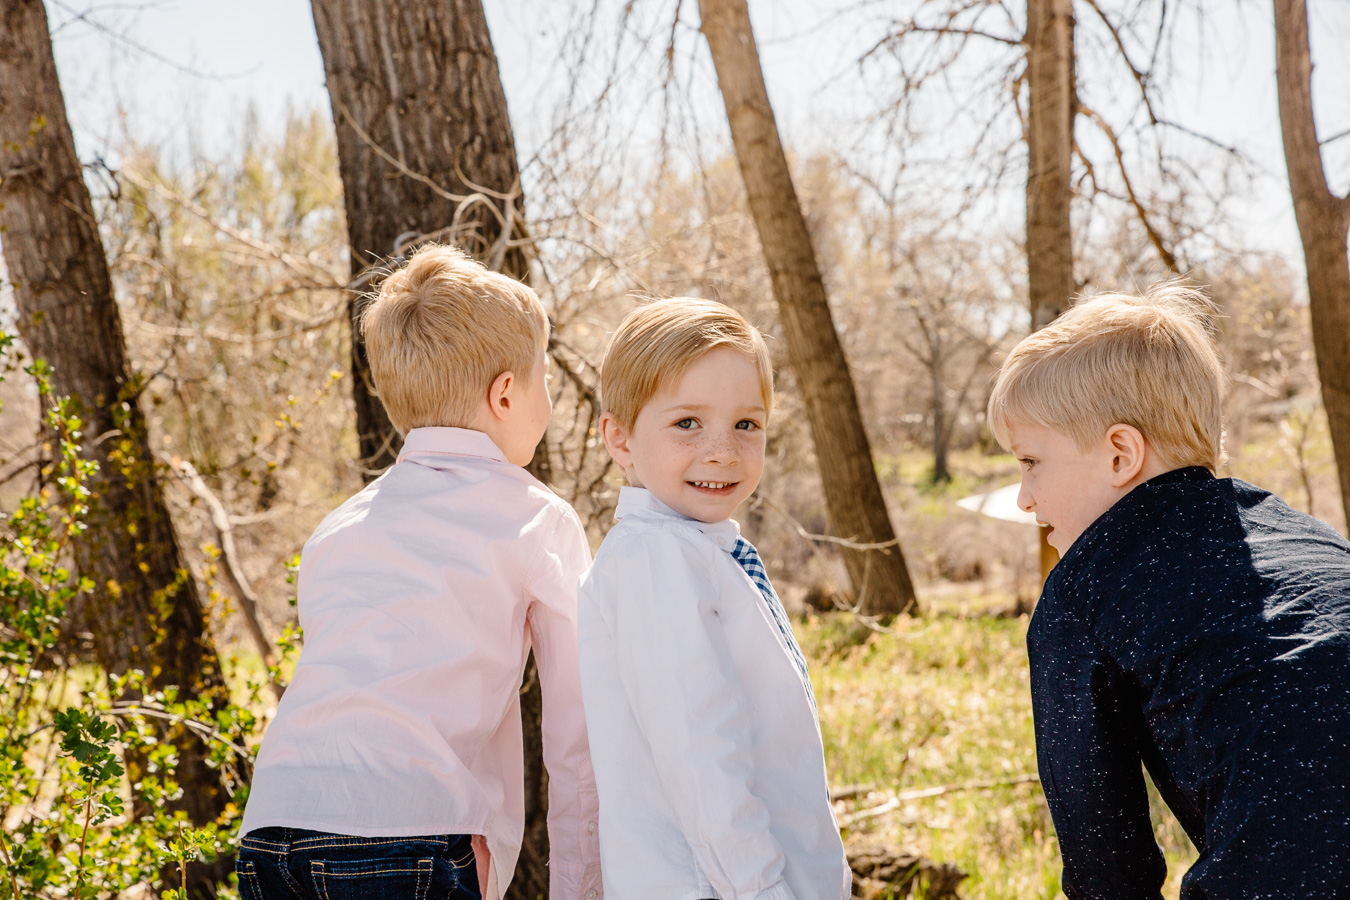 11-Schulz-April-Denver-Family-Lifestyle-Photographer-002.jpg